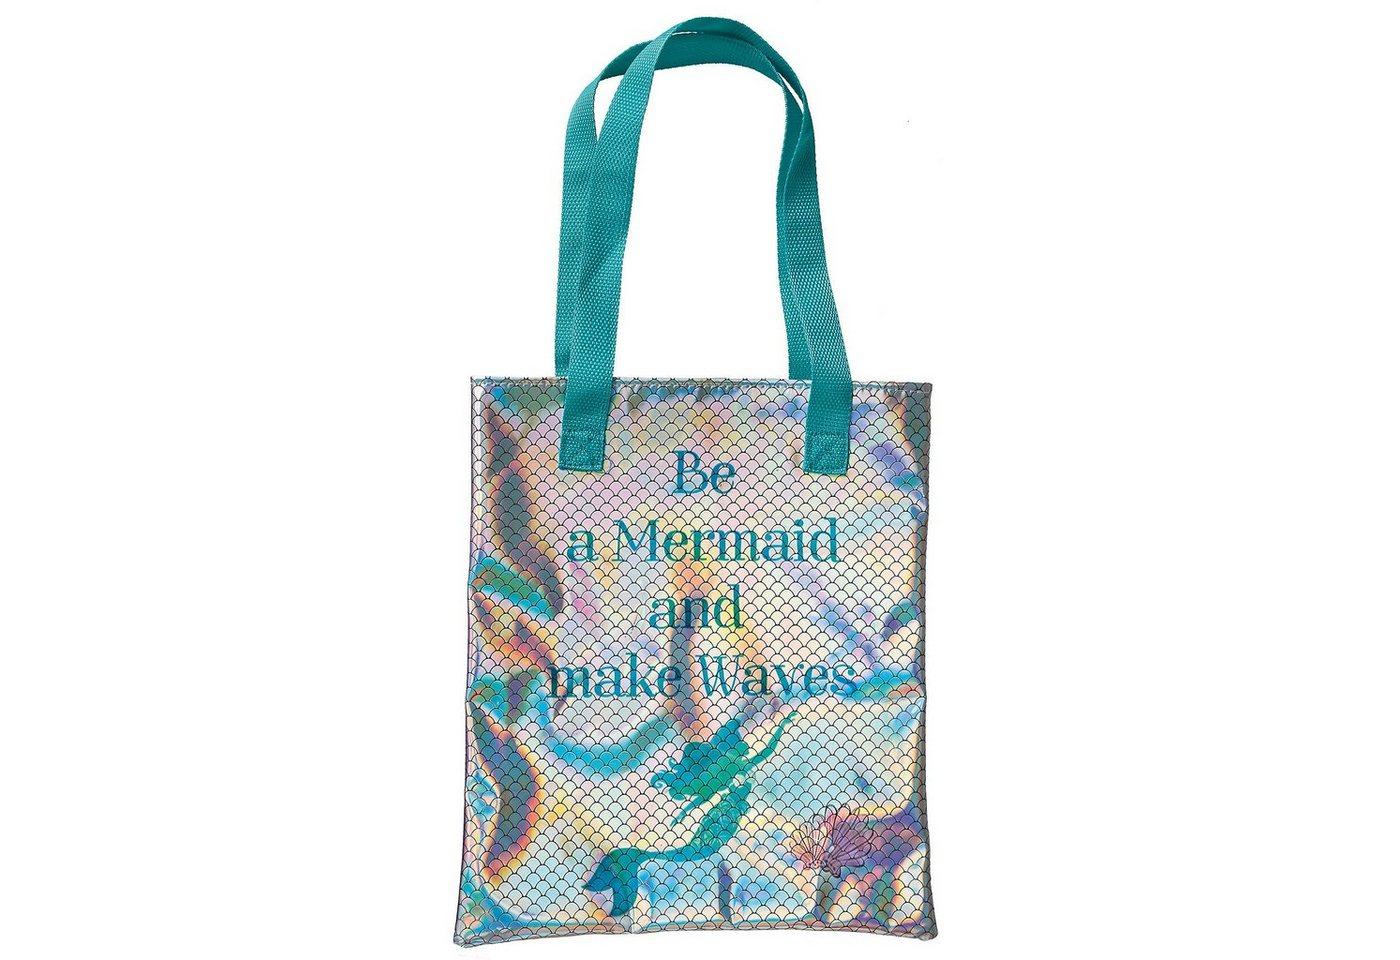 Damen UNDERCOVER Strandtasche Arielle bunt,  mehrfarbig   04043946285533